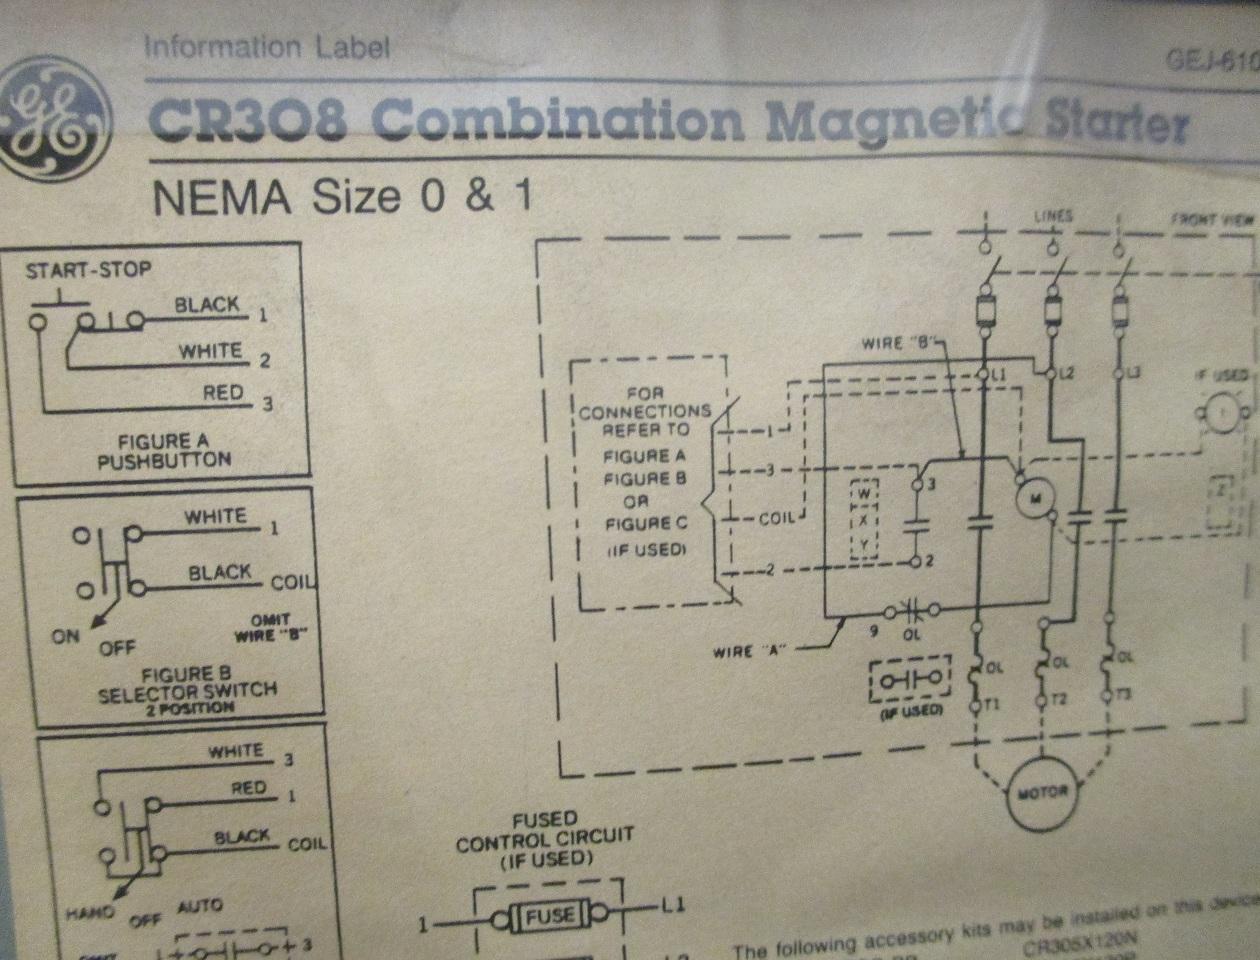 dis3585 ge combination magnetic starter cr308 600v max complete enclosure 300 line control 3?resize\=665%2C507 ge cr 308 motor starter wiring diagram wiring diagrams  at beritabola.co